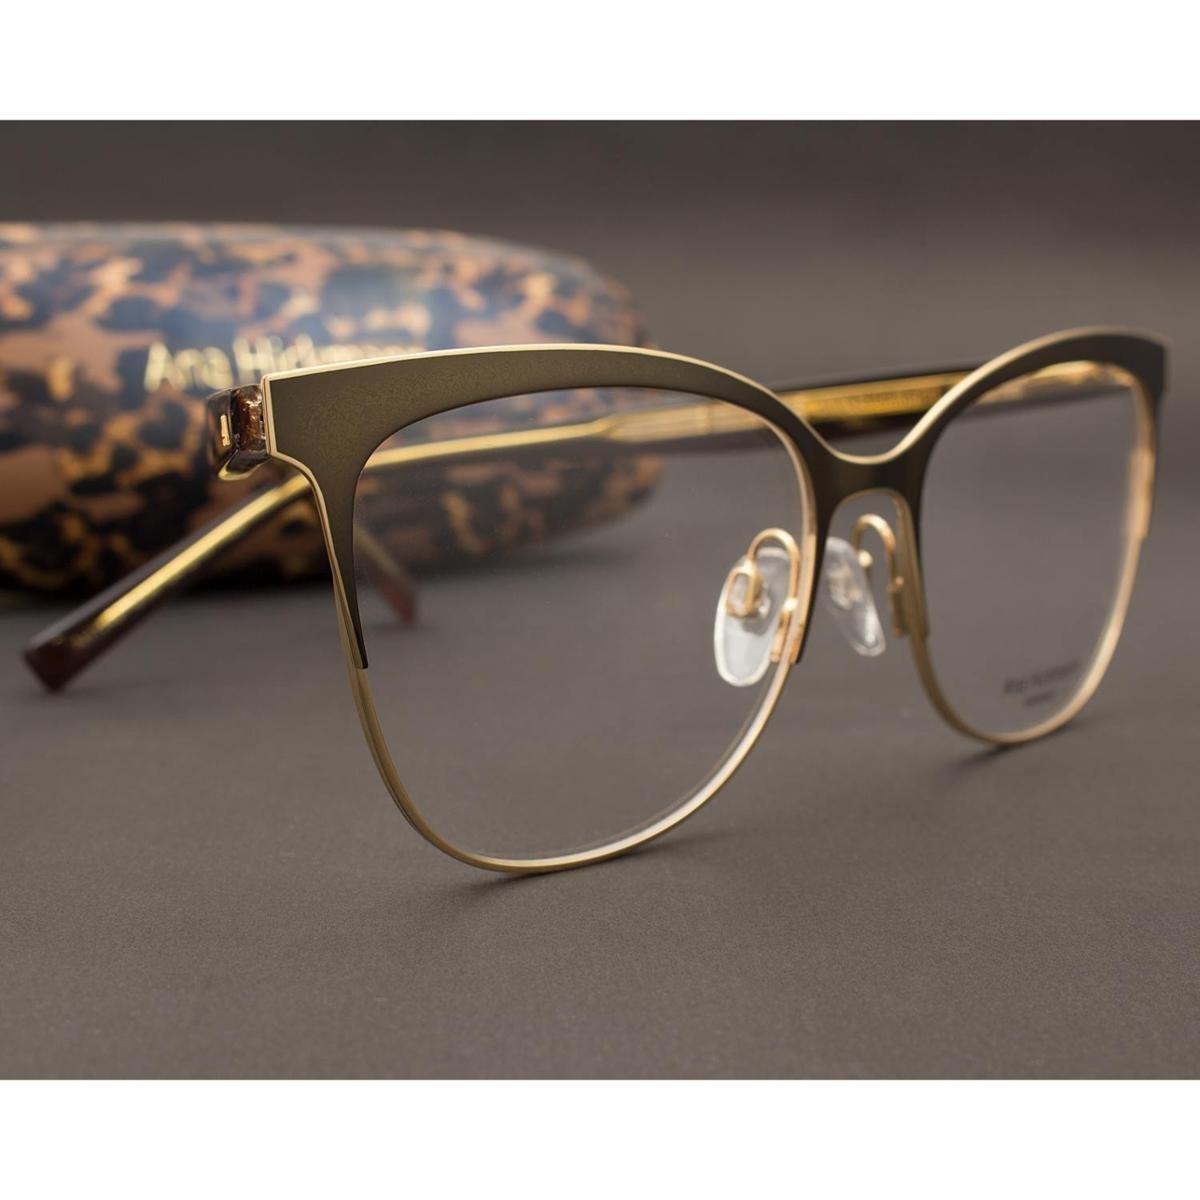 Armação Oculos Grau Ana Hickmann London I Night Titanio